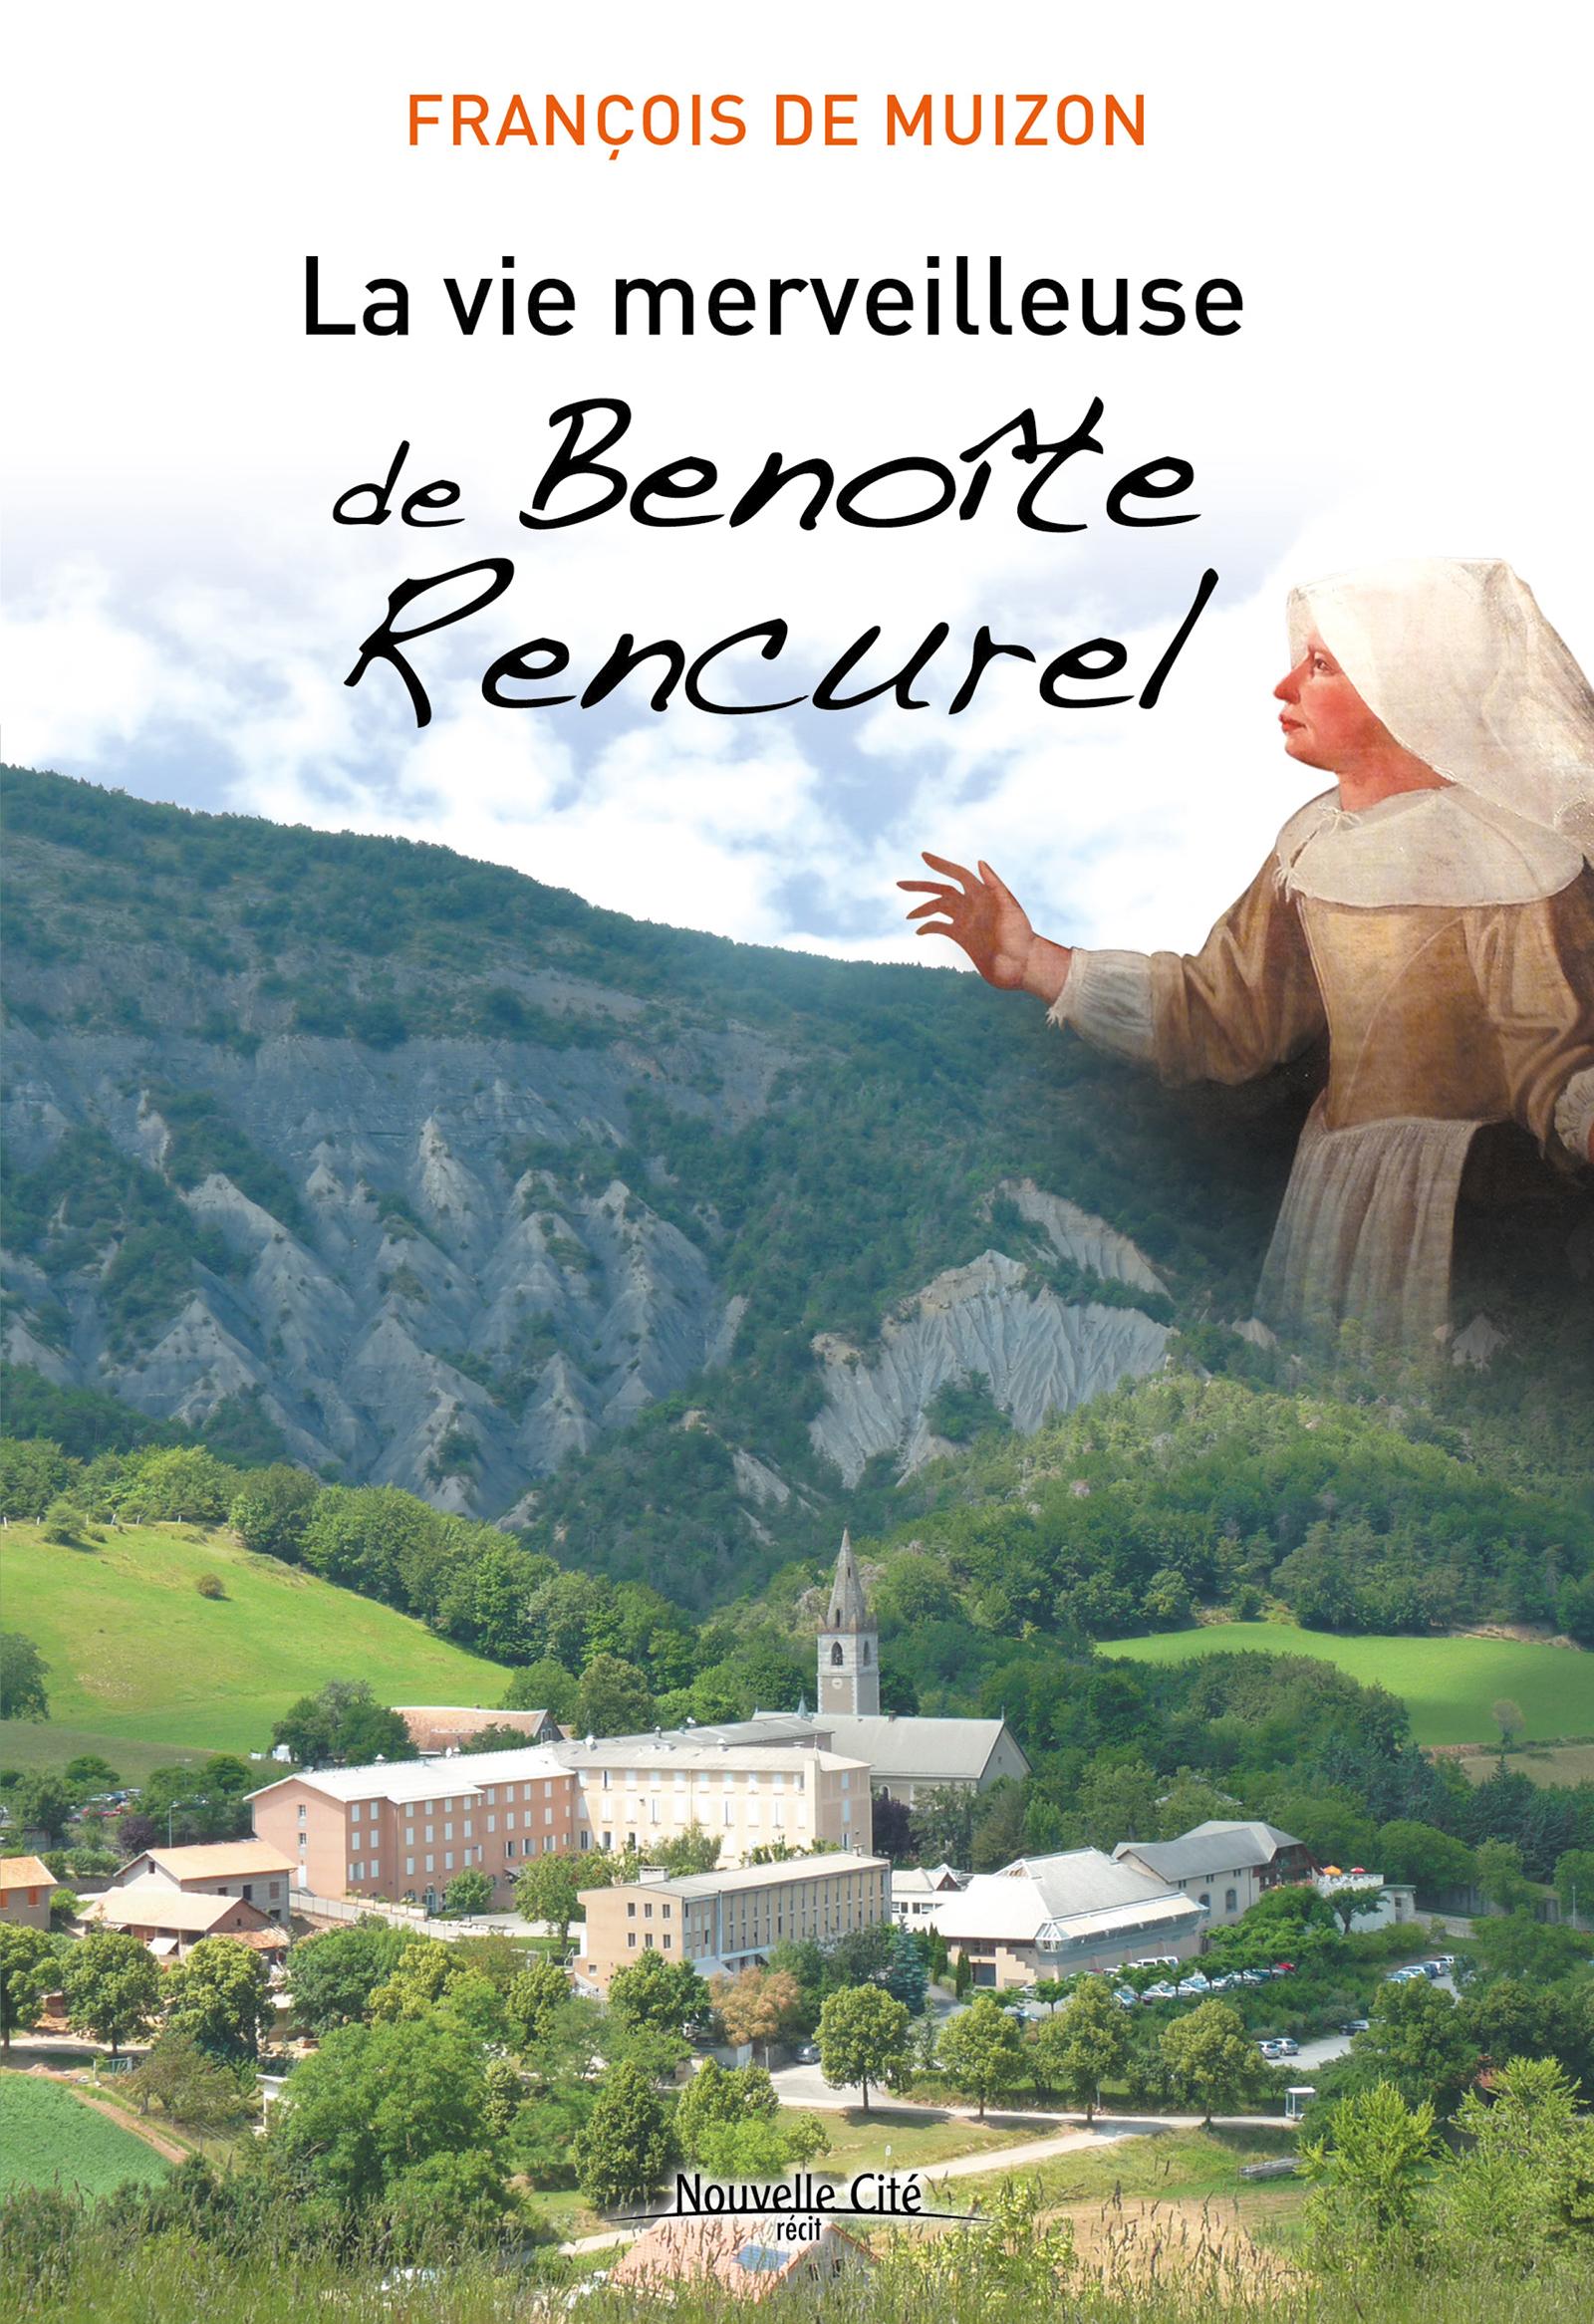 La Vie merveilleuse de Benoîte Rencurel